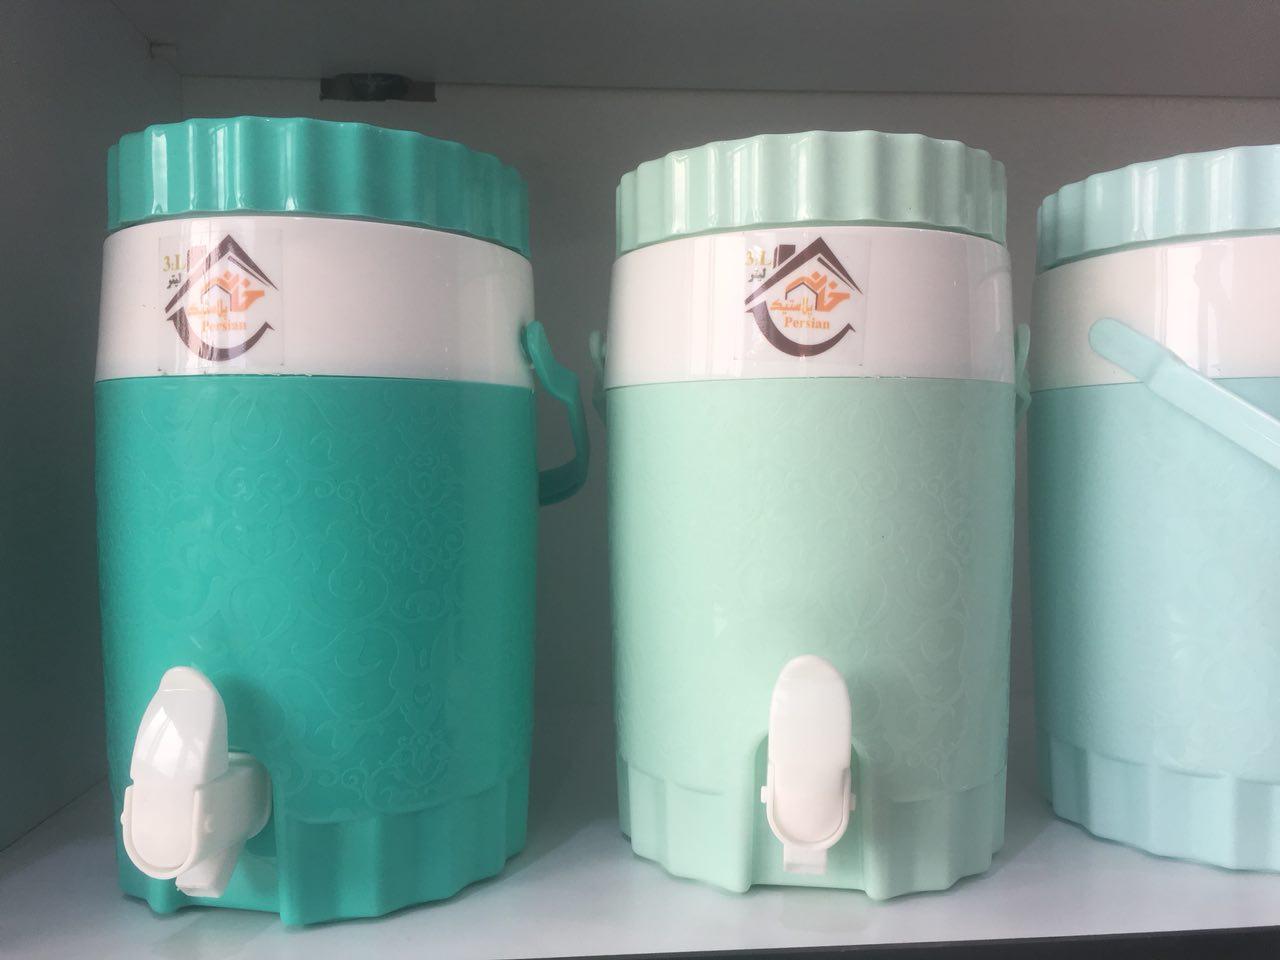 خرید پستی  کلمن شیر دار لیوان دار 3 لیتری